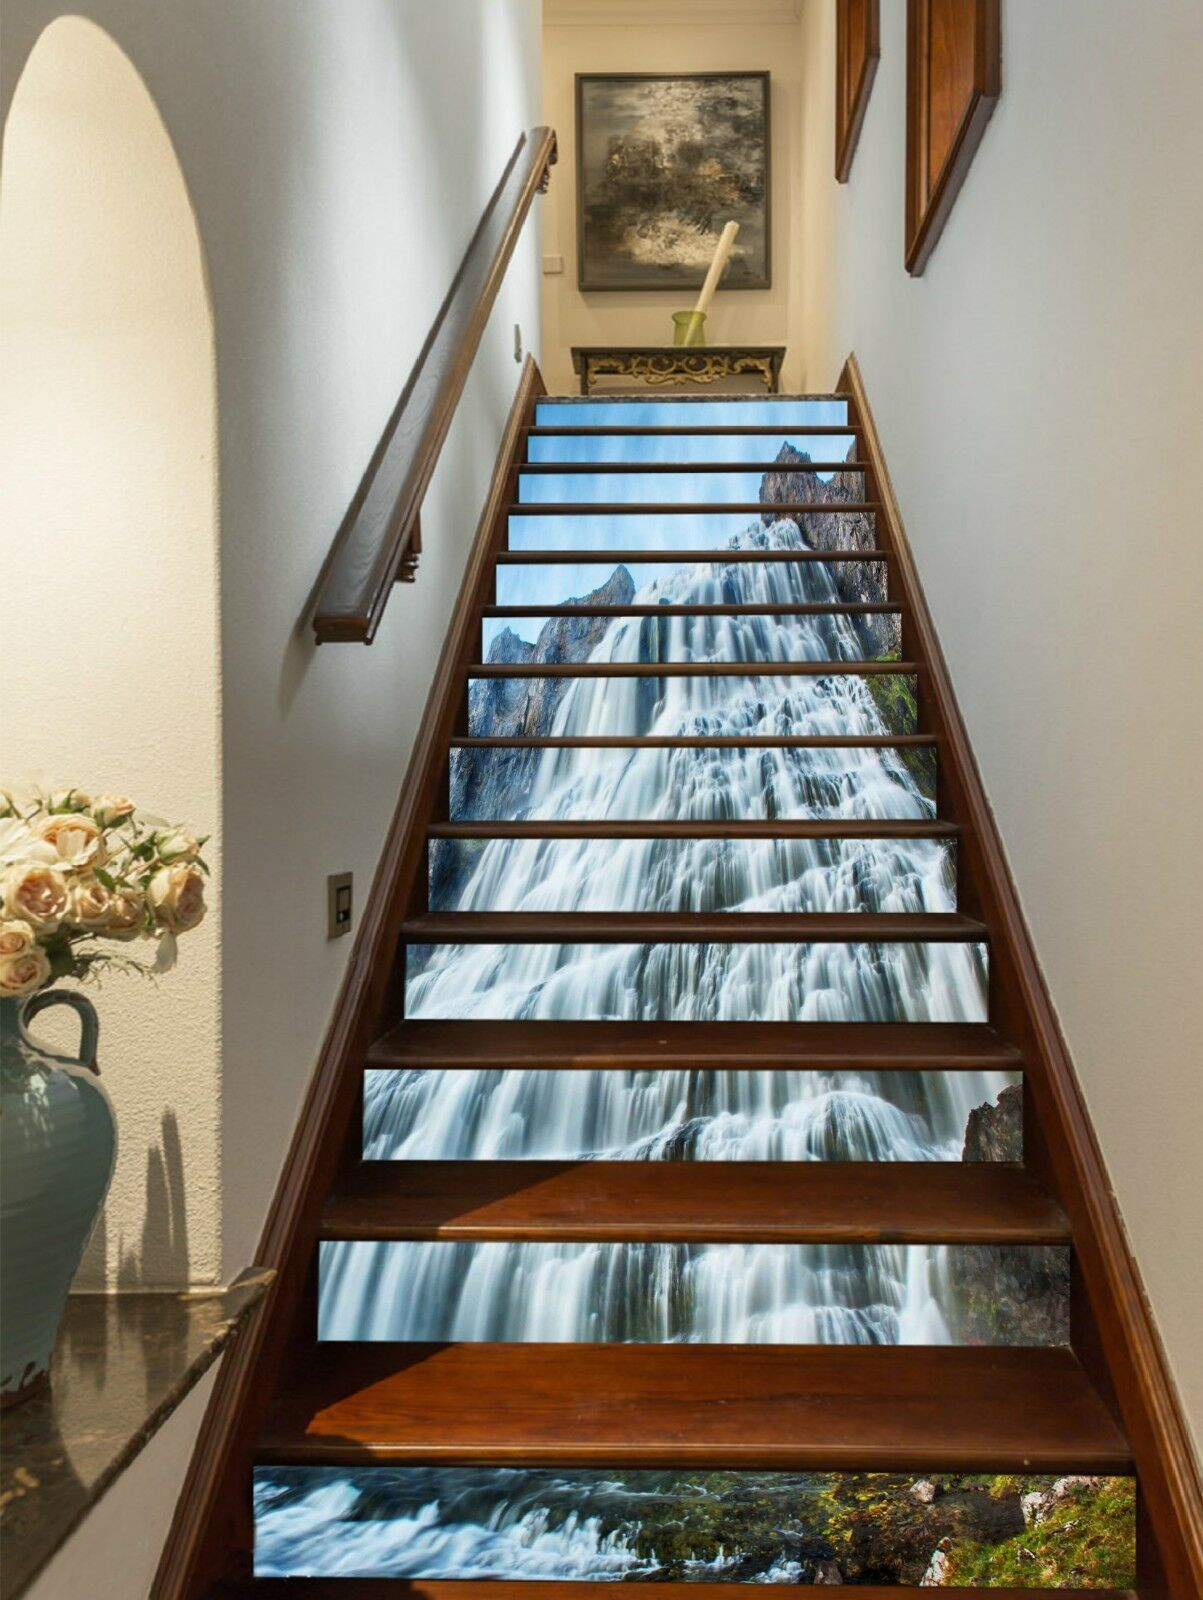 3D Wasserfall 2413 Stair Risers Dekoration Fototapete Vinyl Aufkleber Tapete DE